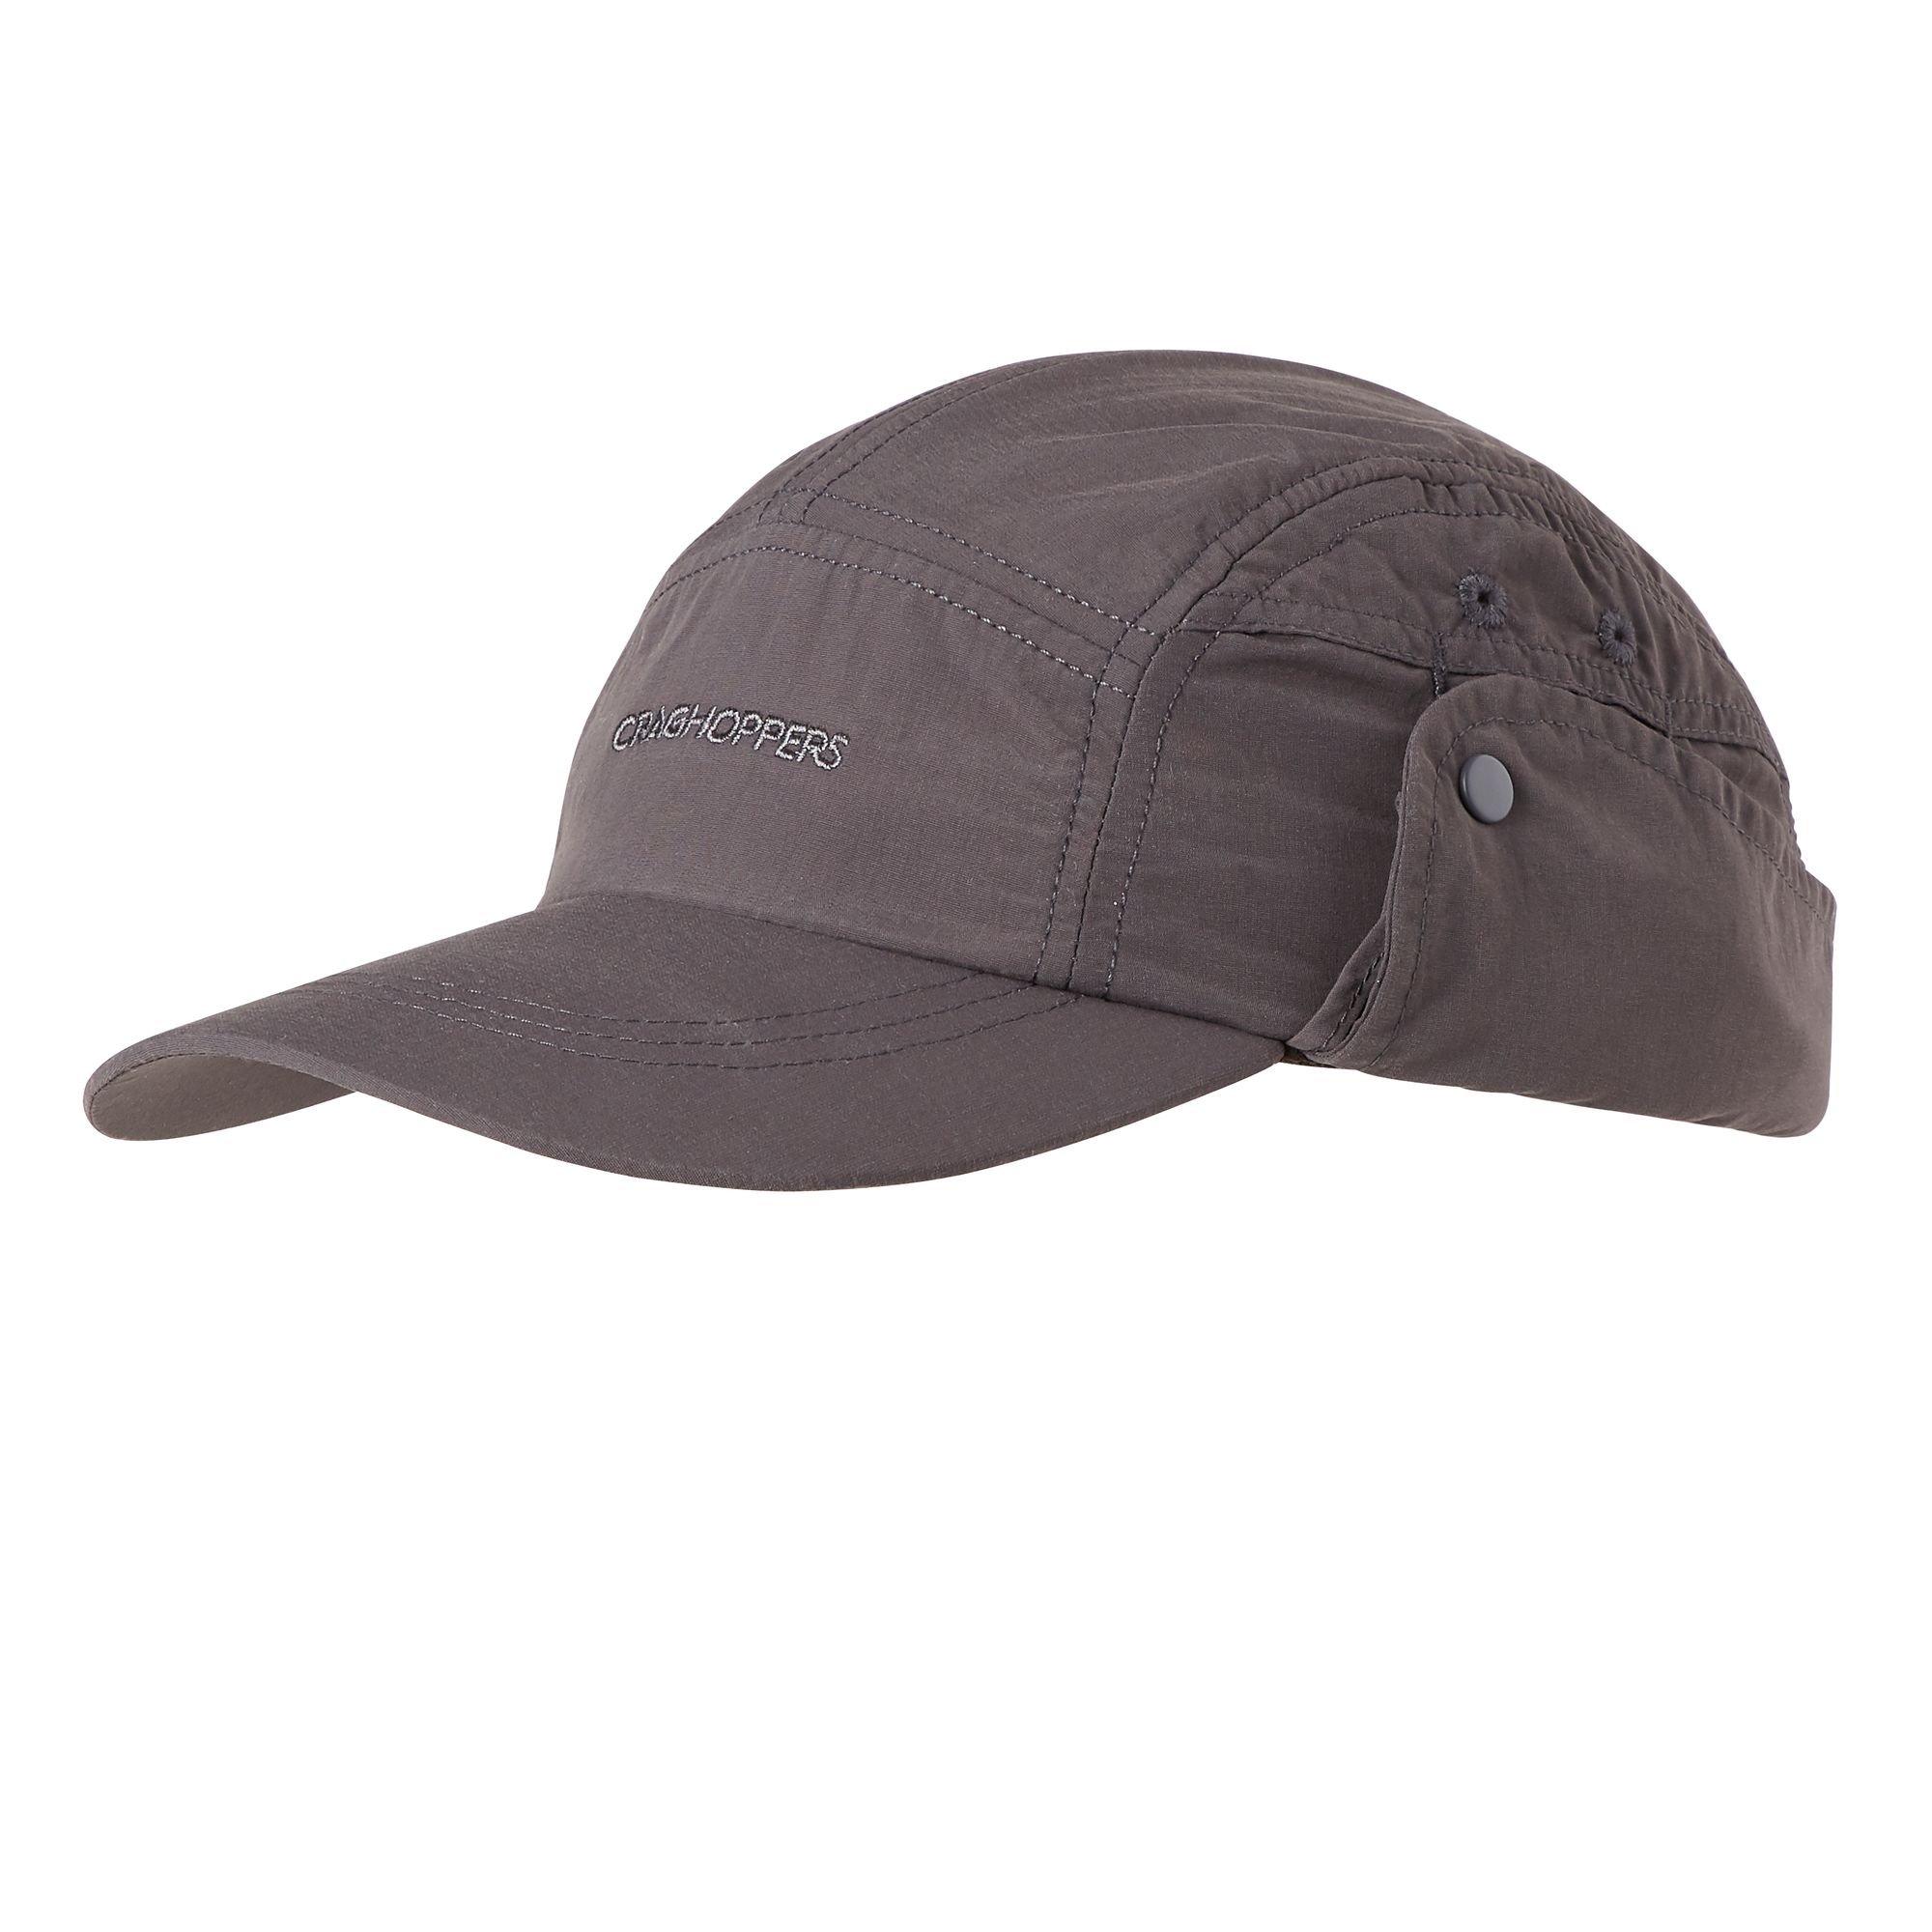 87d54cd2d Craghoppers Men's Nosilife Desert Hat Insect Repellent Accessories product  image